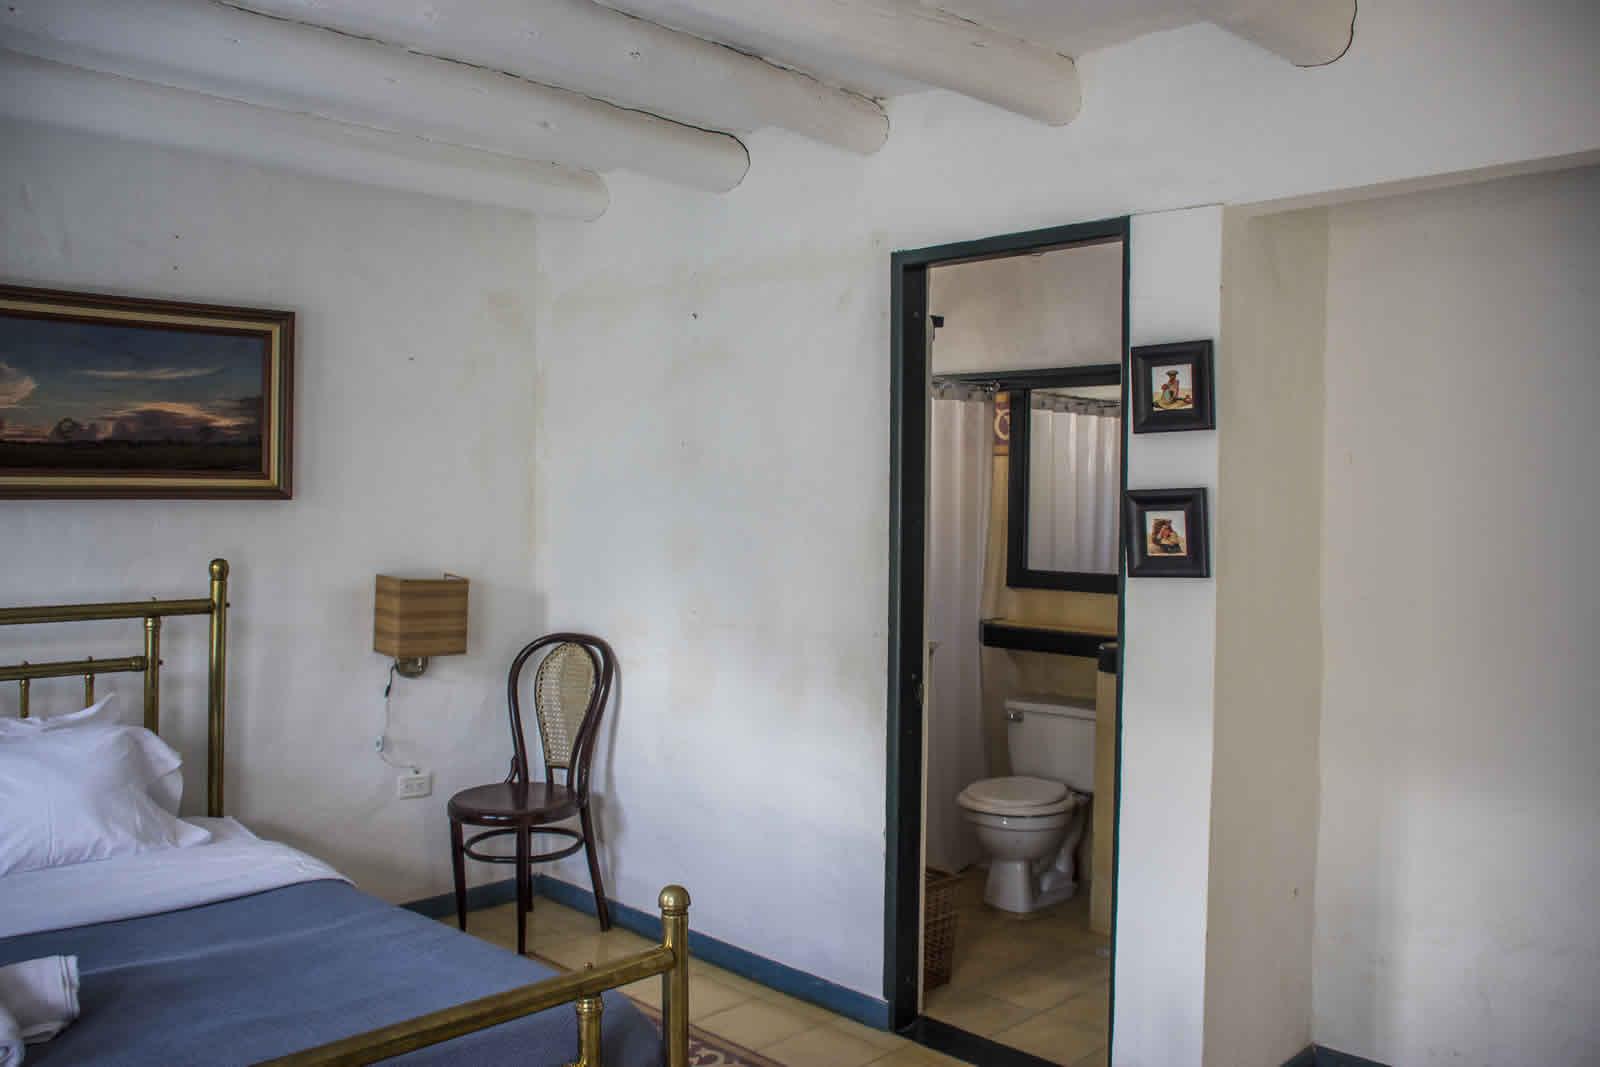 Alquiler casa Tulato Villa de Leyva baño habitación 2